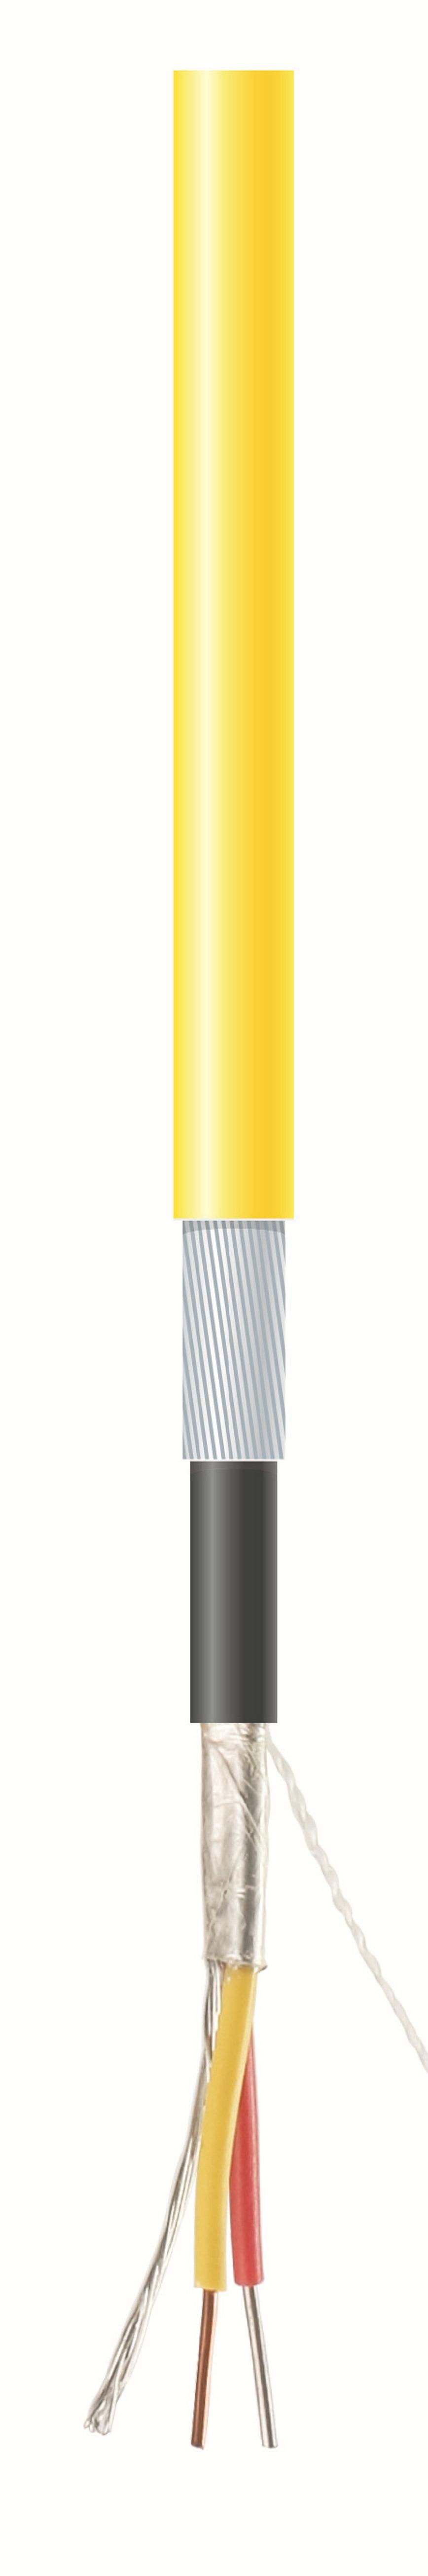 Logo Thermocouple Extension/CompensatingCable